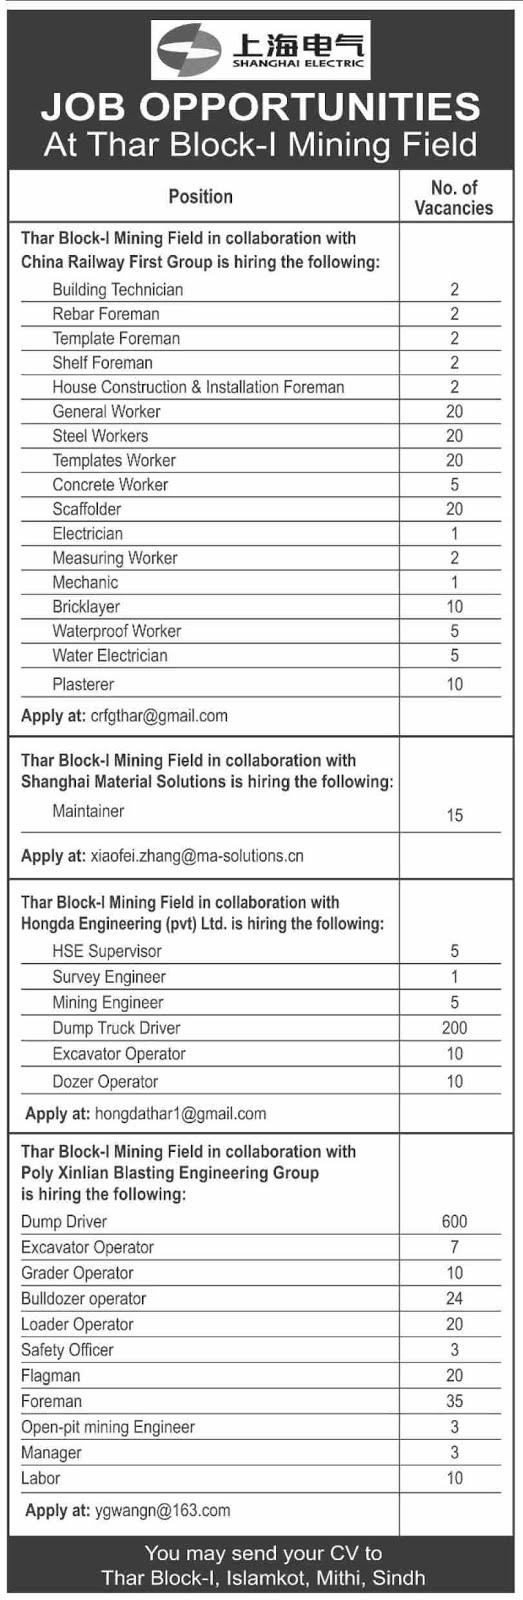 Shanghai Electric Jobs August 2020 (1110 Posts)